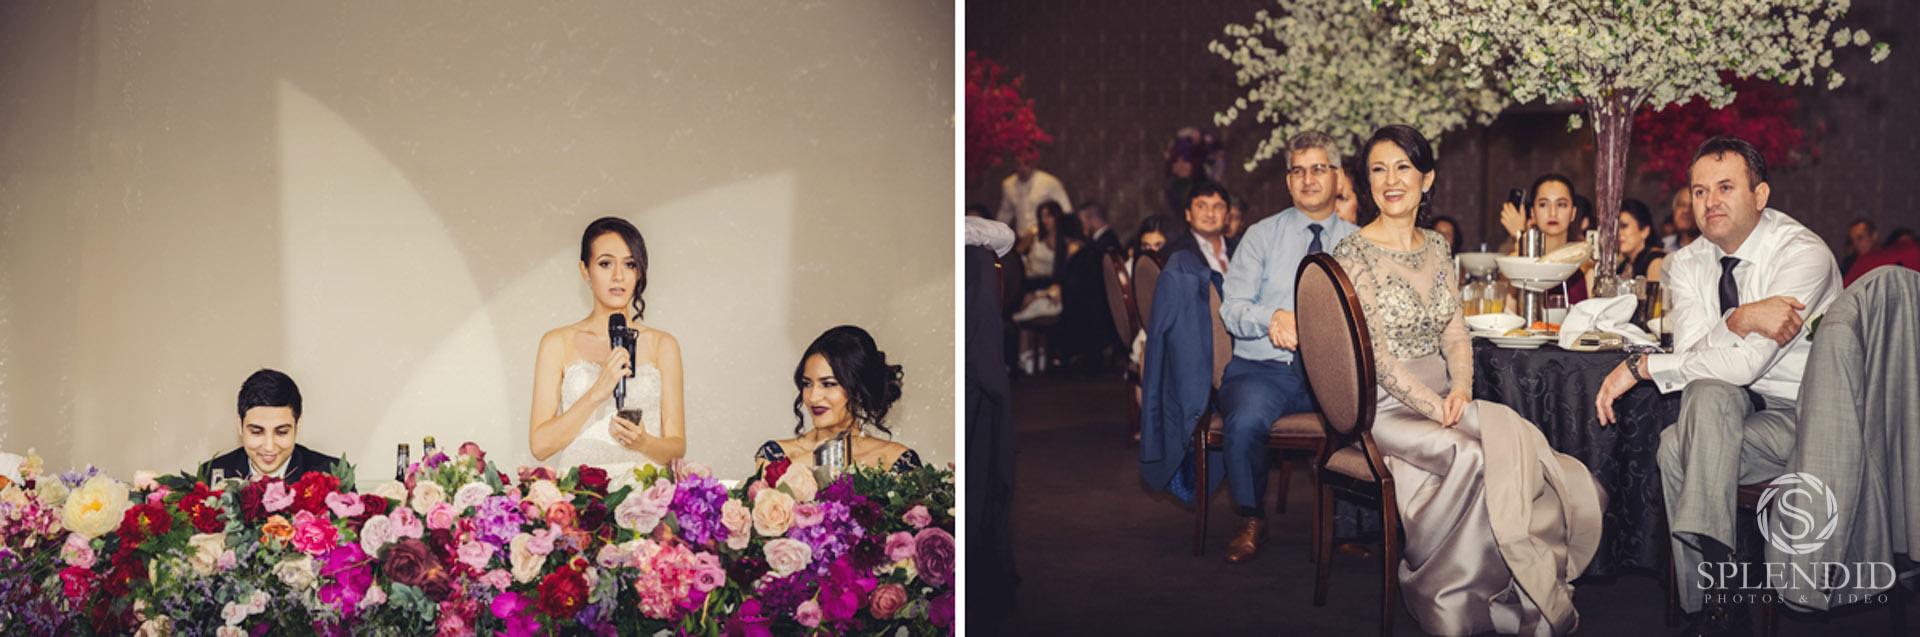 Cem and Cisem Wedding_88